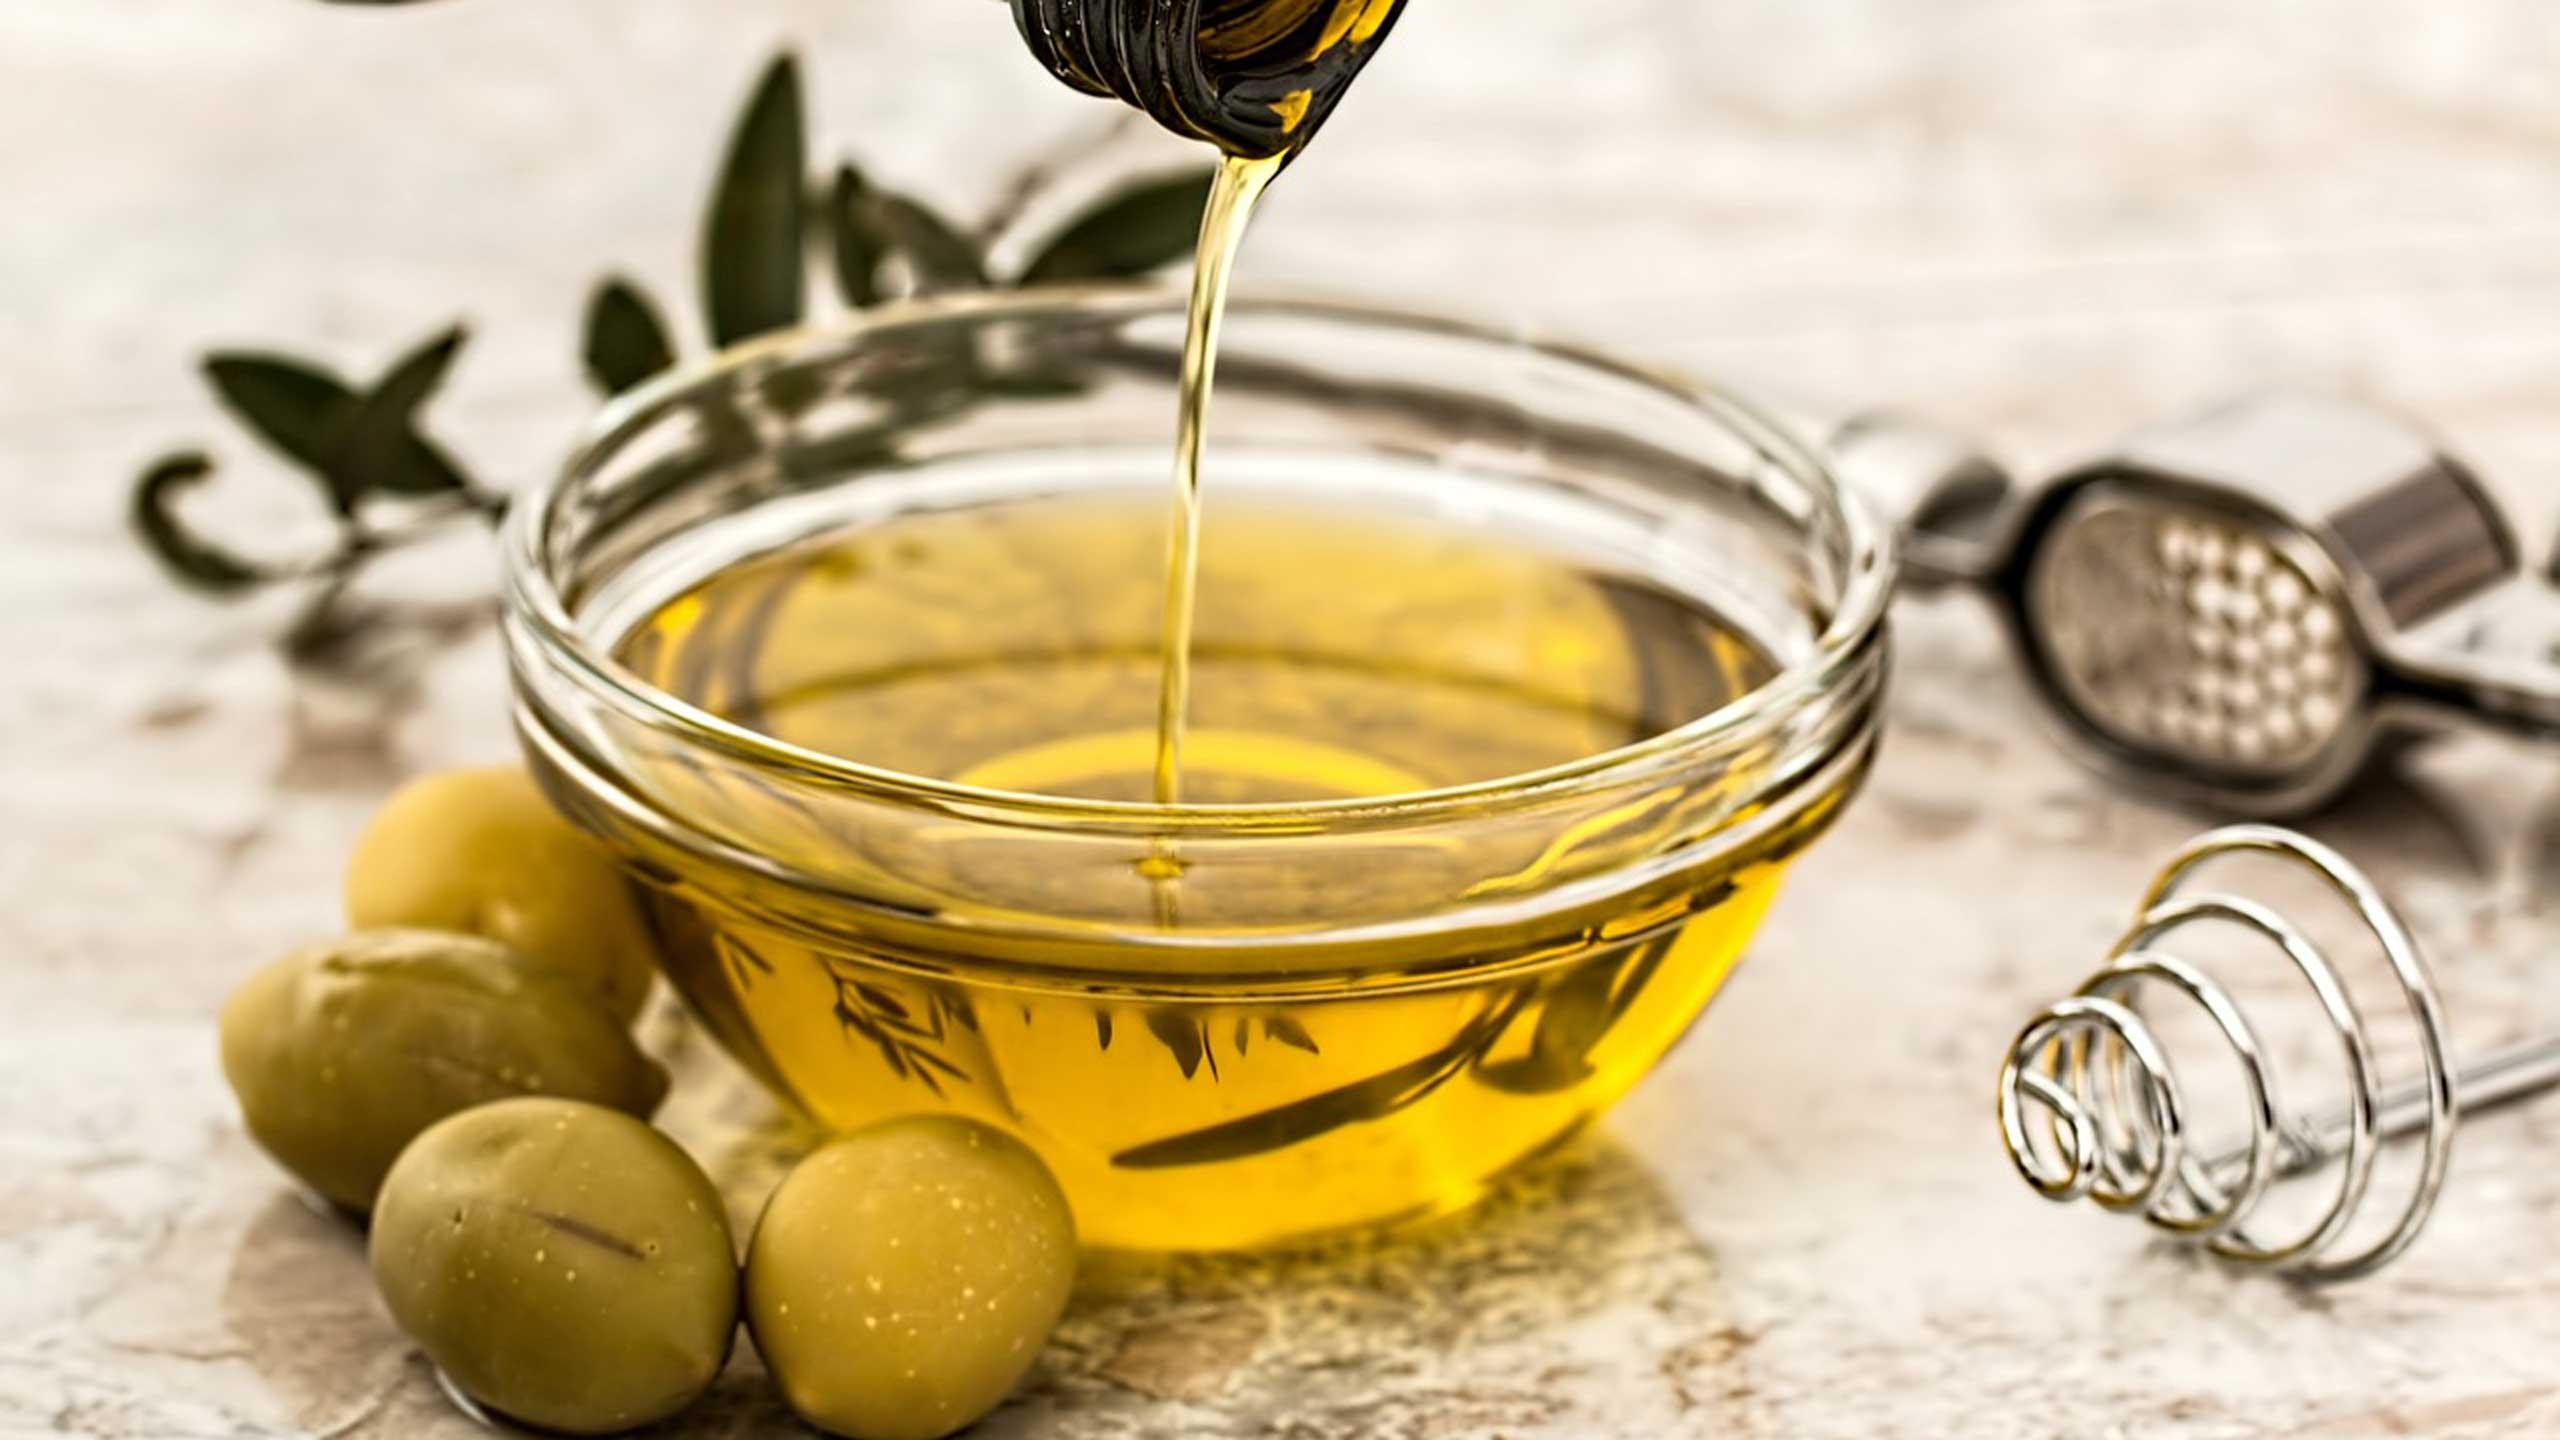 aceites de olivo supermercado